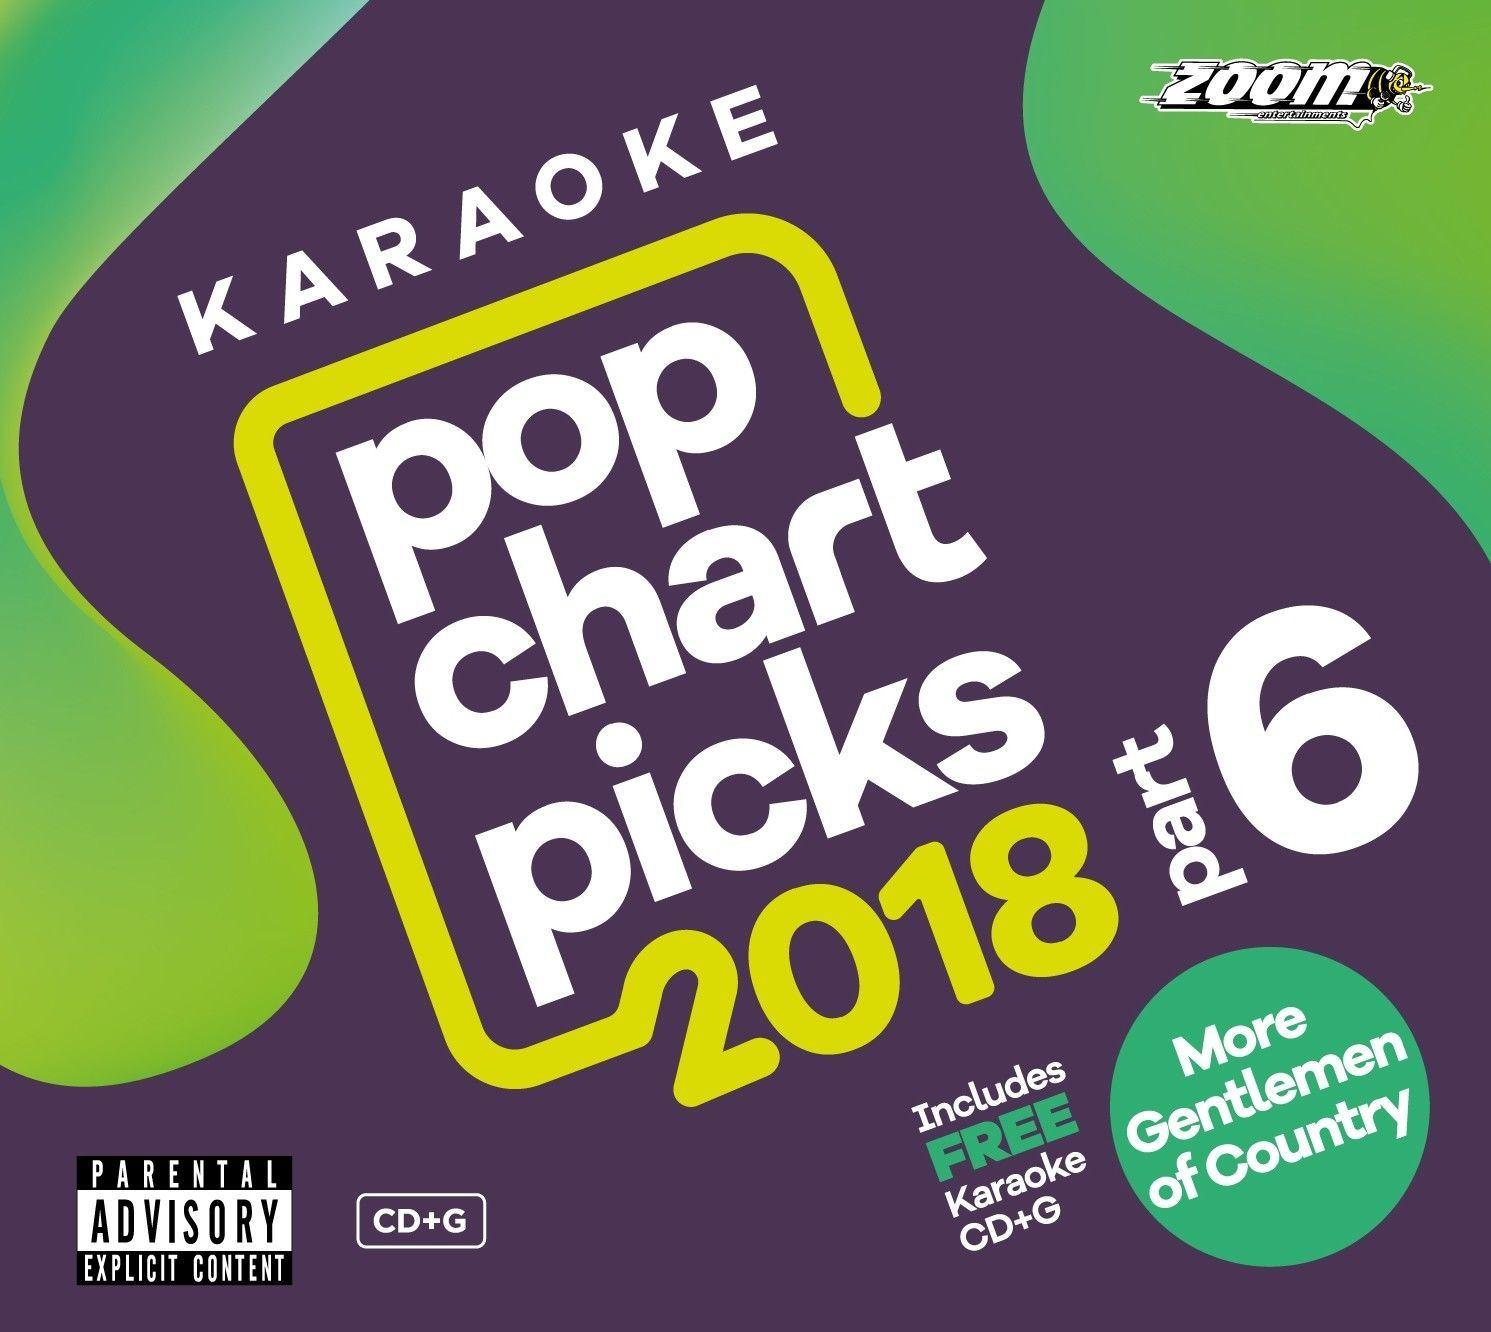 Details about Zoom Karaoke CD+G - Pop Chart Picks 2018 Part 6 + FREE  Country Gentlemen